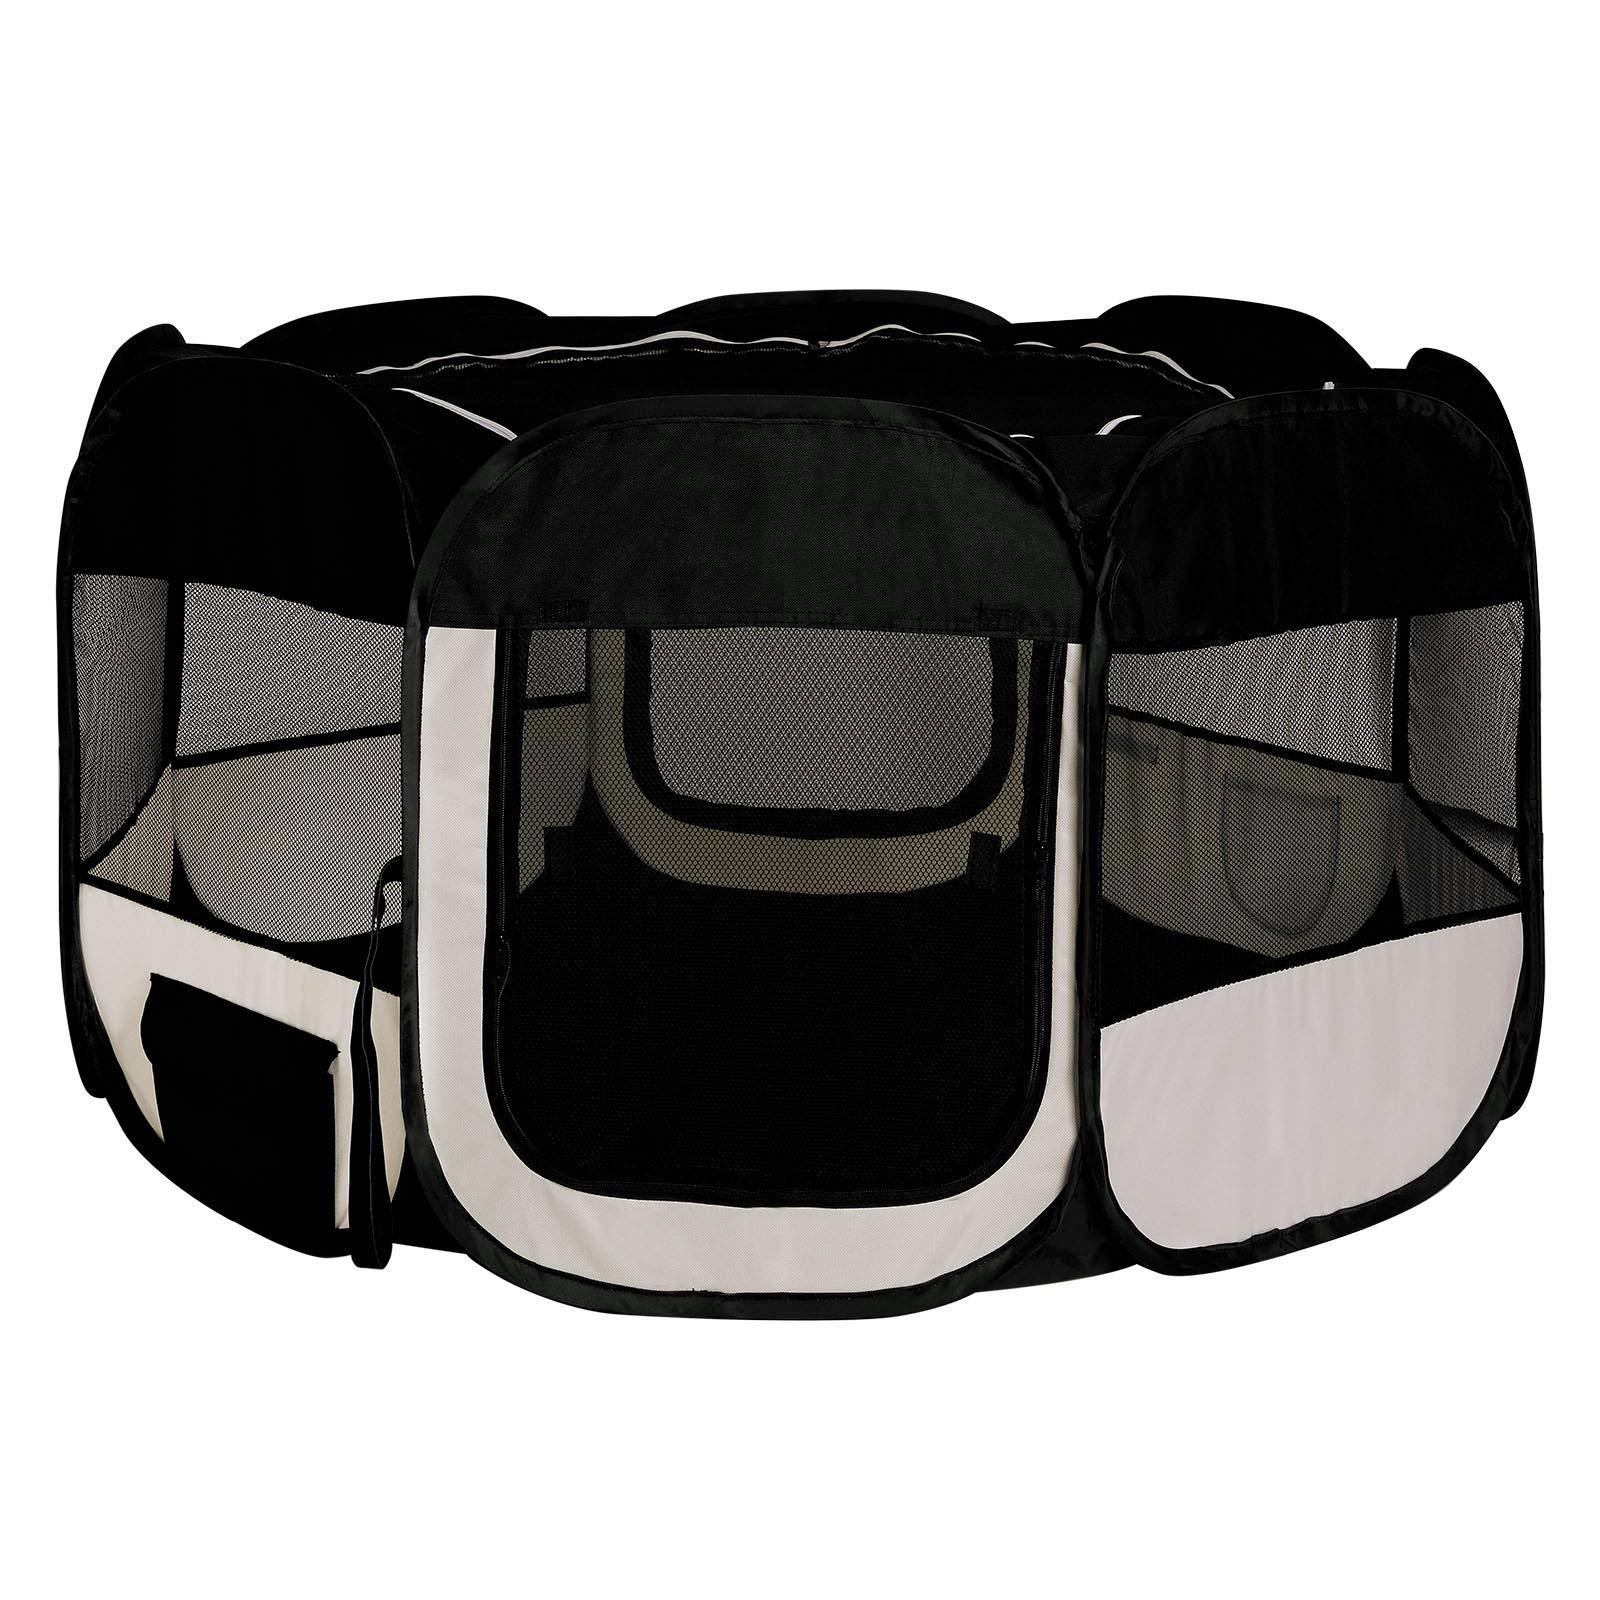 Dibea Pp00255 Puppy Play Pen Outdoor Enclosure for Indoor and Outdoor Use Black/Beige by Dibea